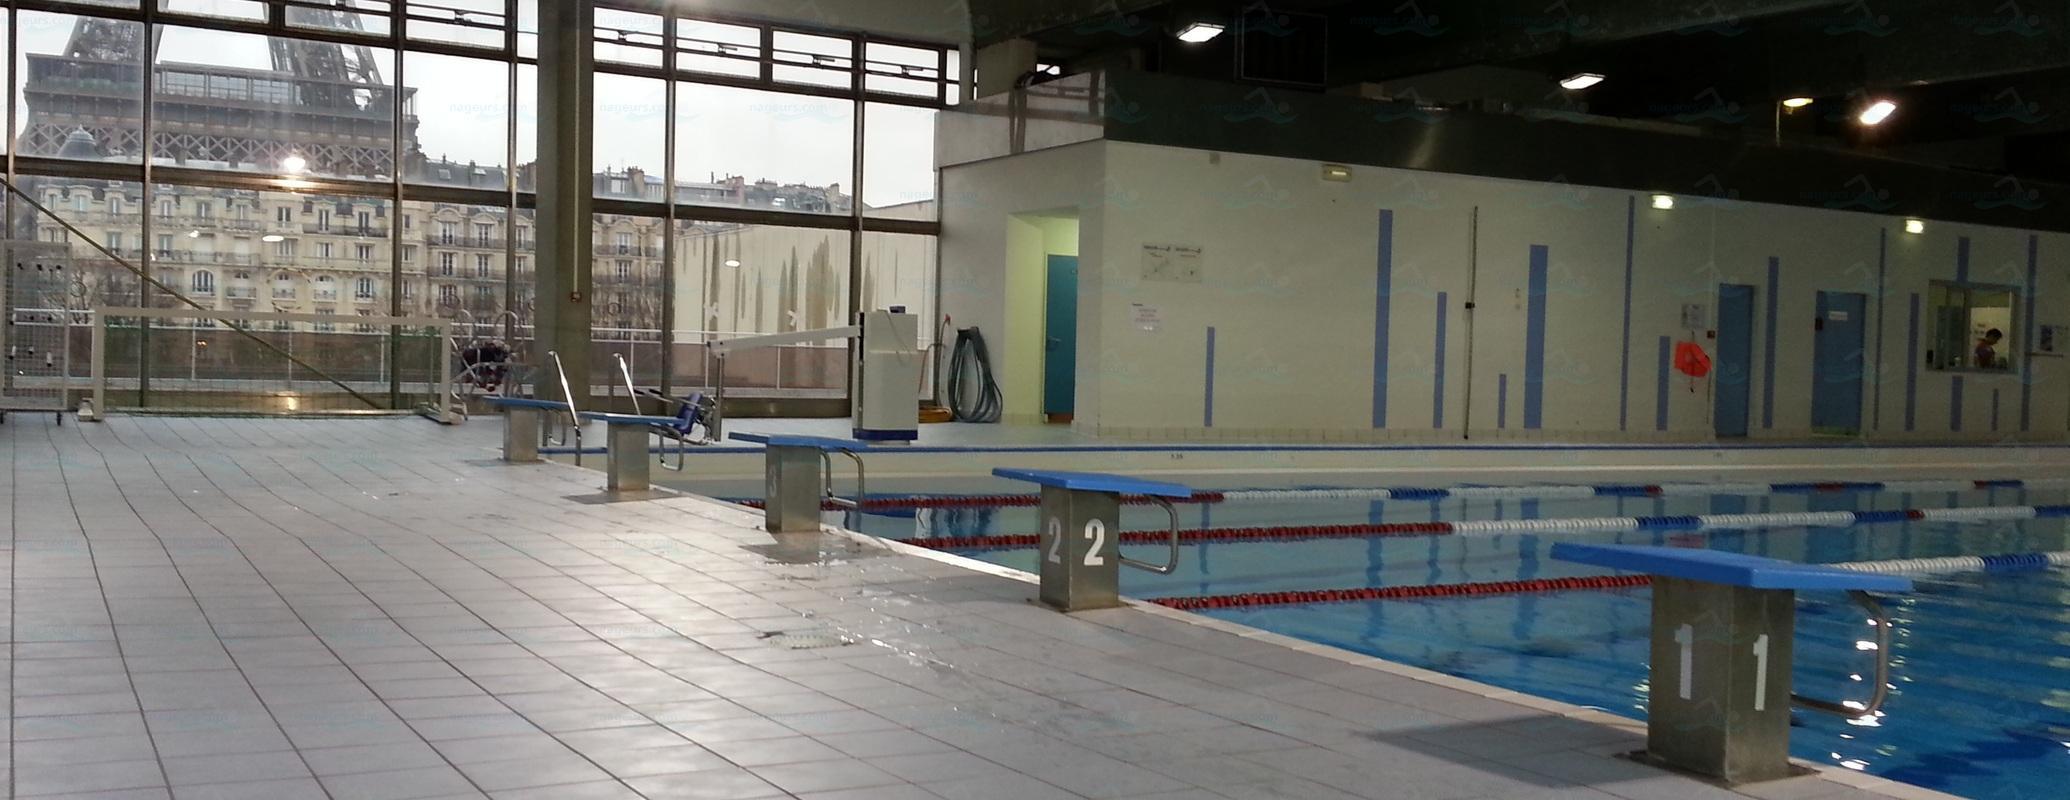 Photos piscine emile anthoine for Horaires piscine beaujon